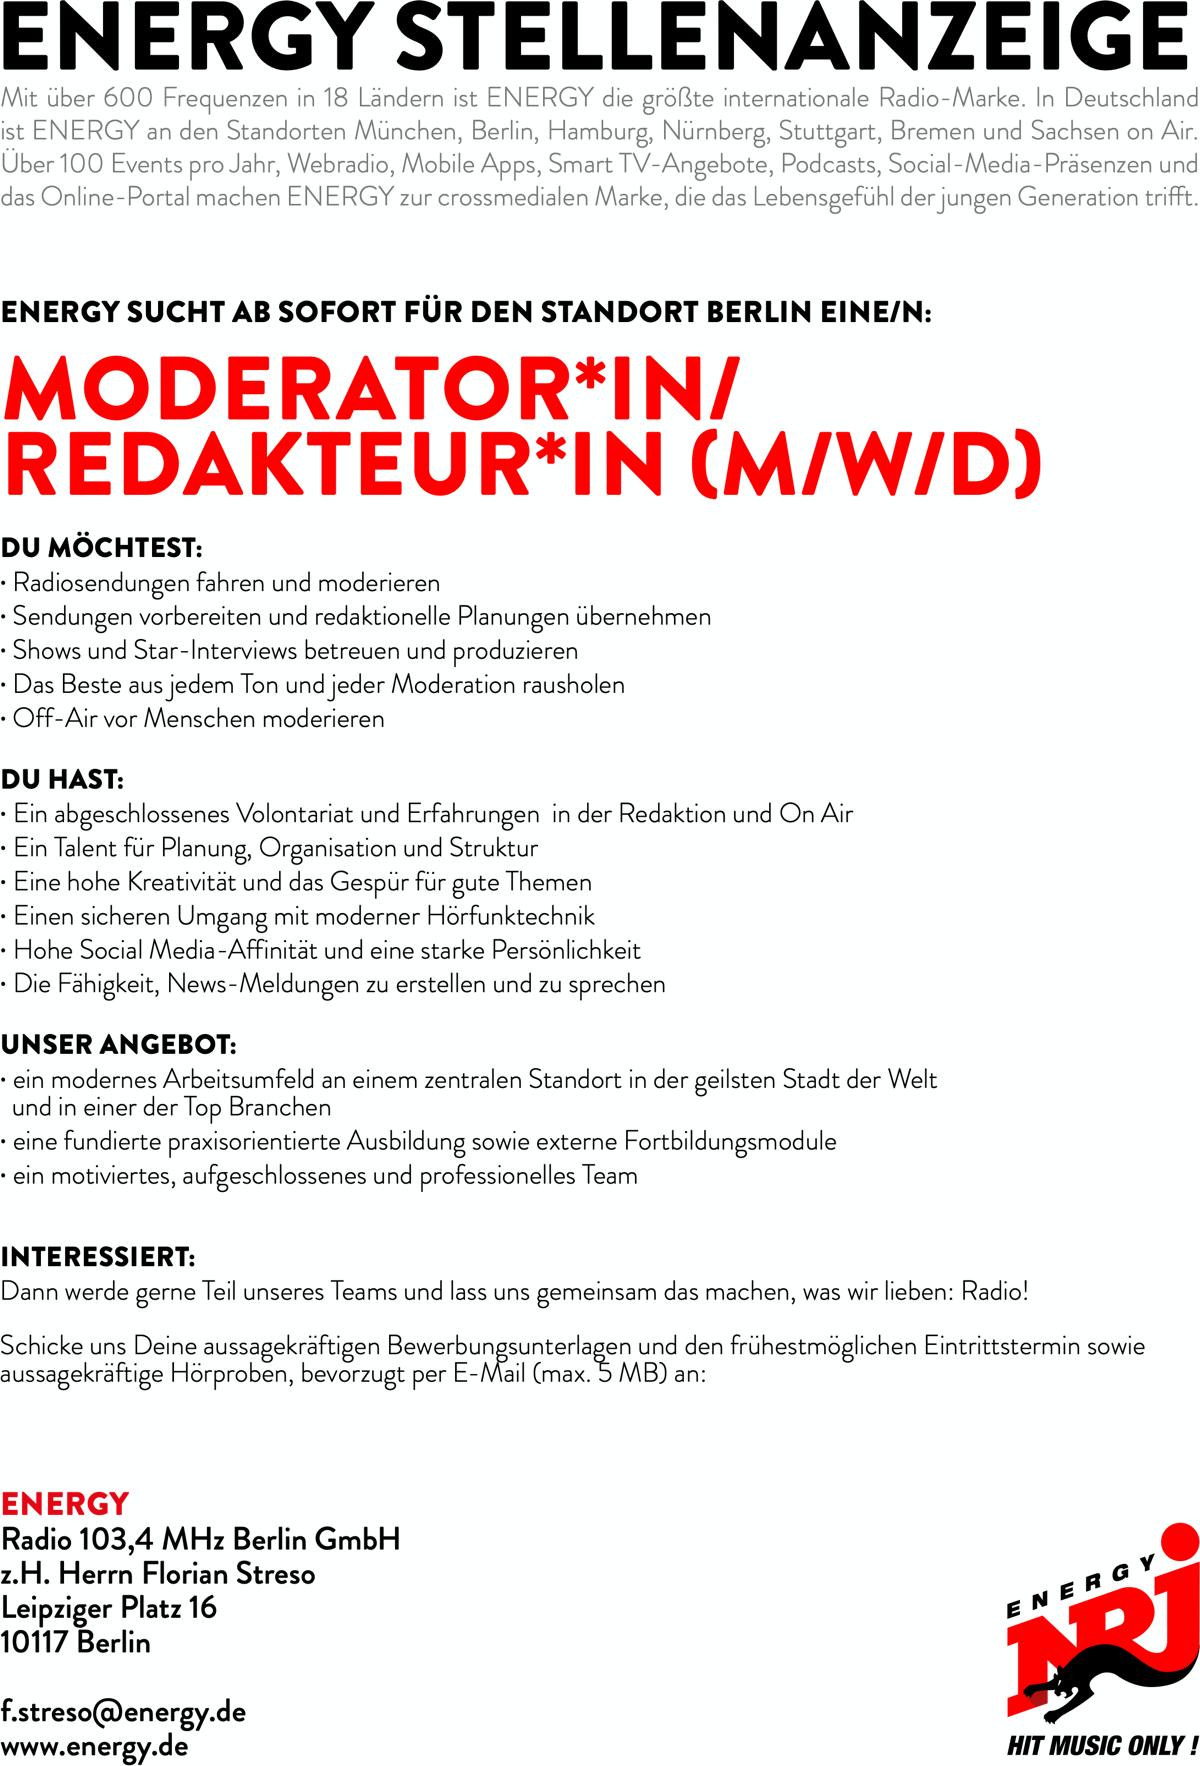 ENERGY Berlin sucht Moderator*in/Redakteur*in (m/w/d)